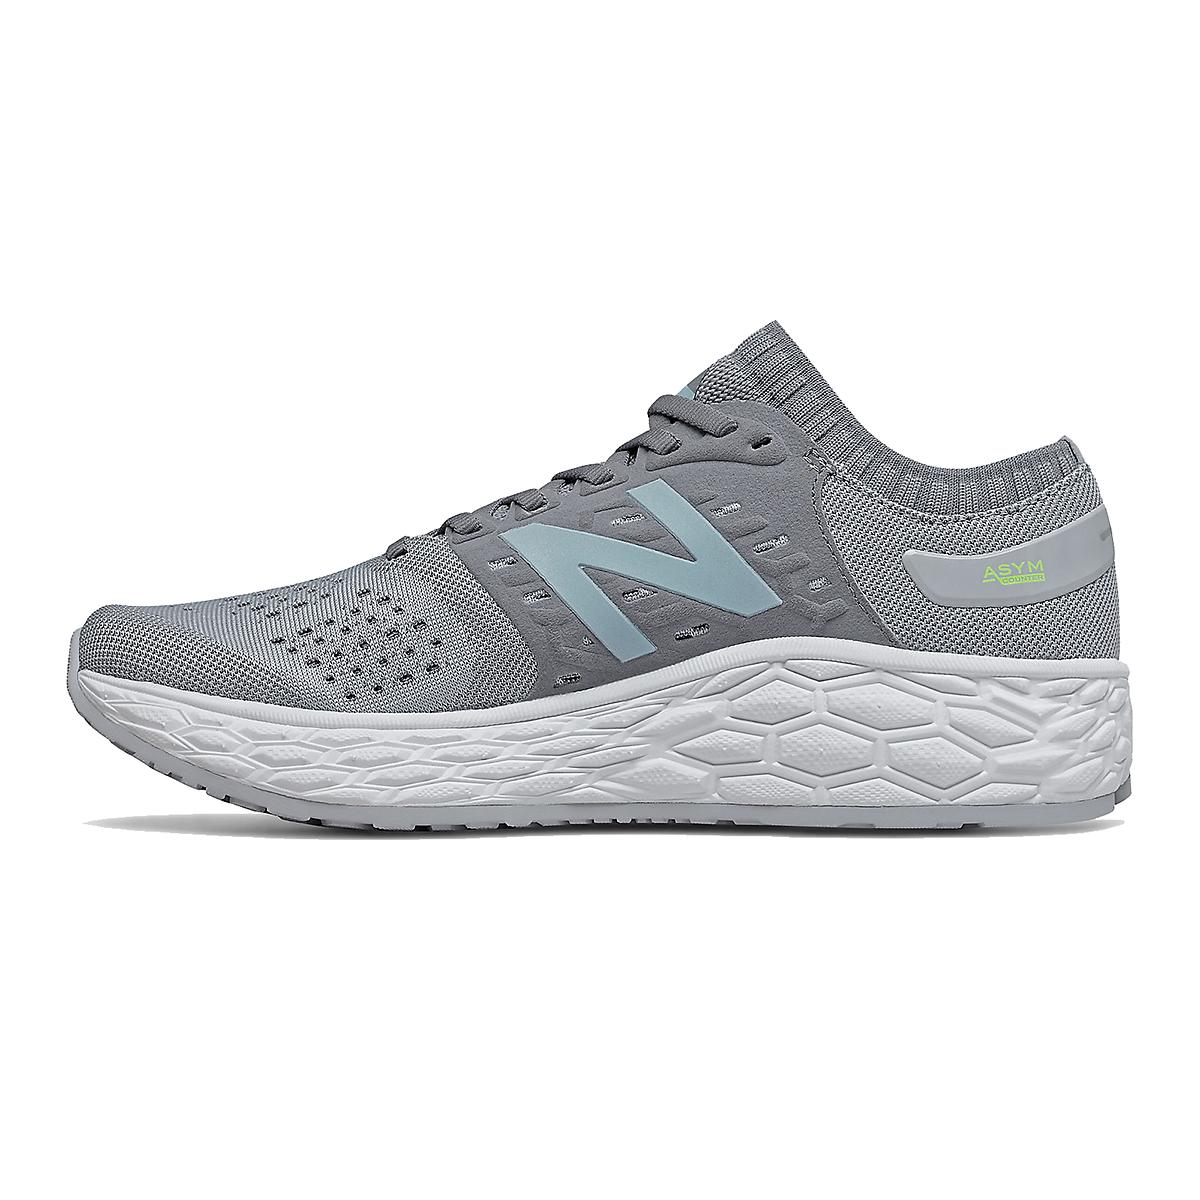 Women's New Balance Fresh Foam Vongo V4 Running Shoe - Color: Light Aluminum - Size: 5.5 - Width: Regular, Light Aluminum, large, image 2